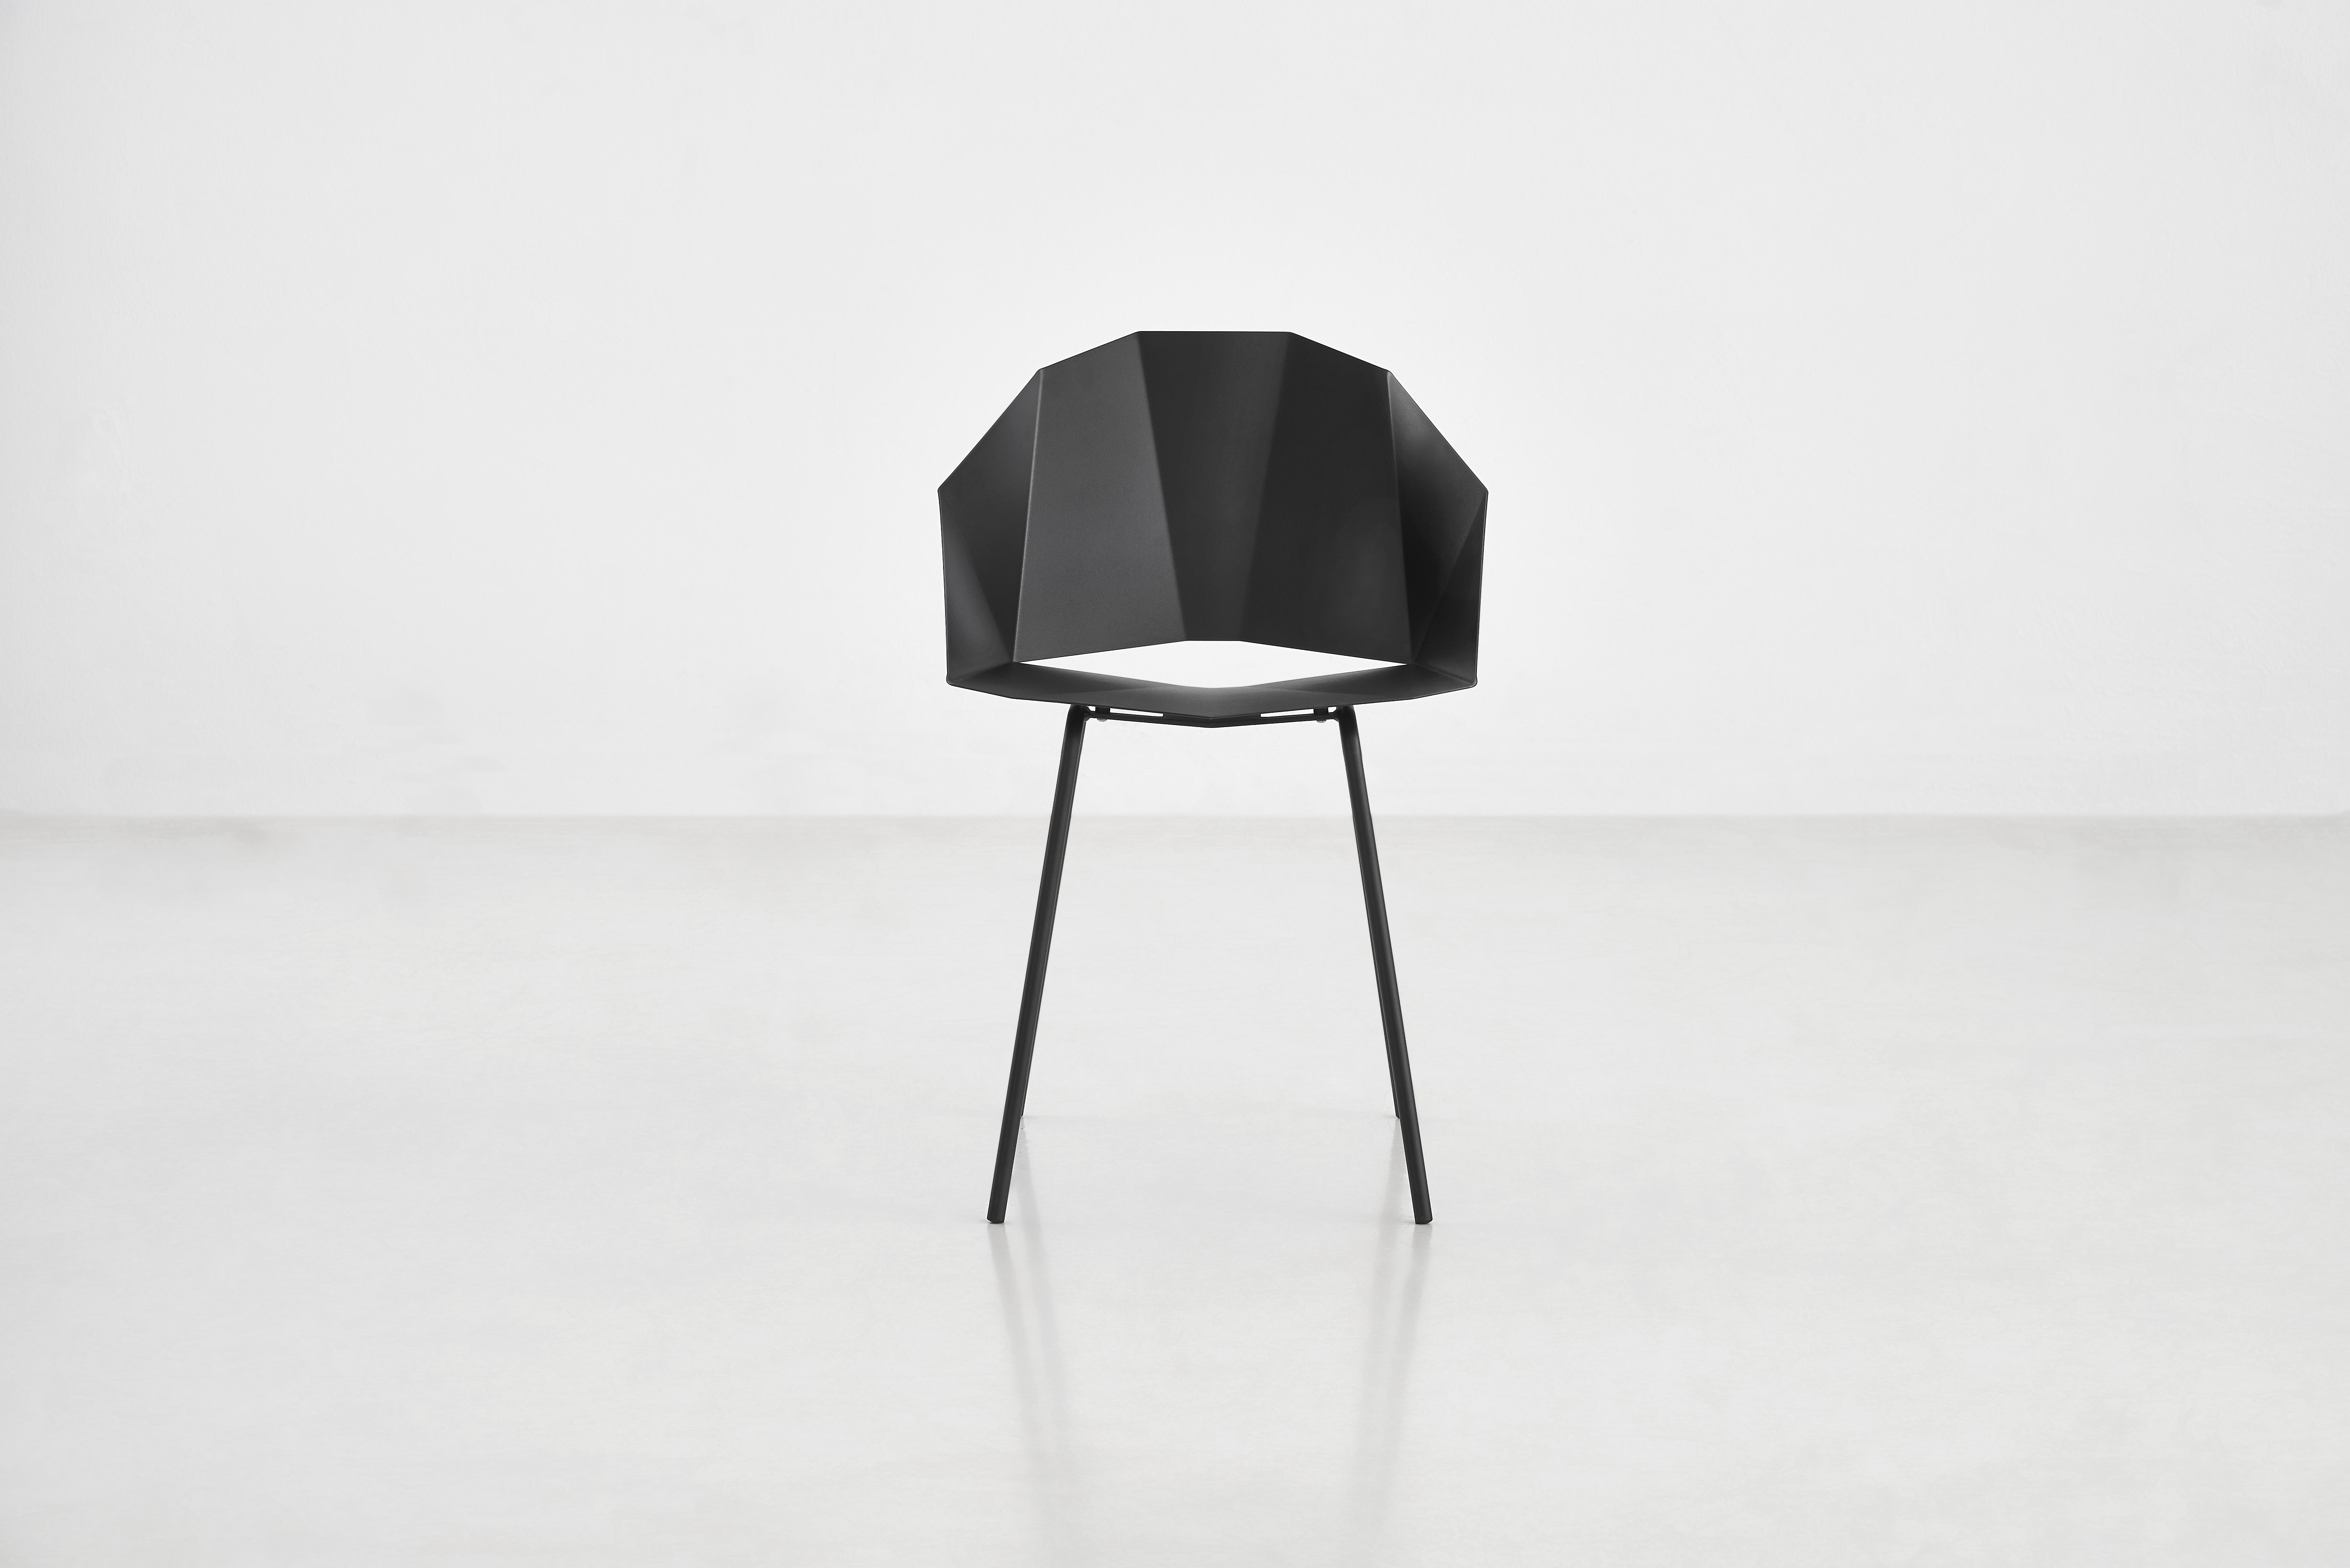 BUK chair